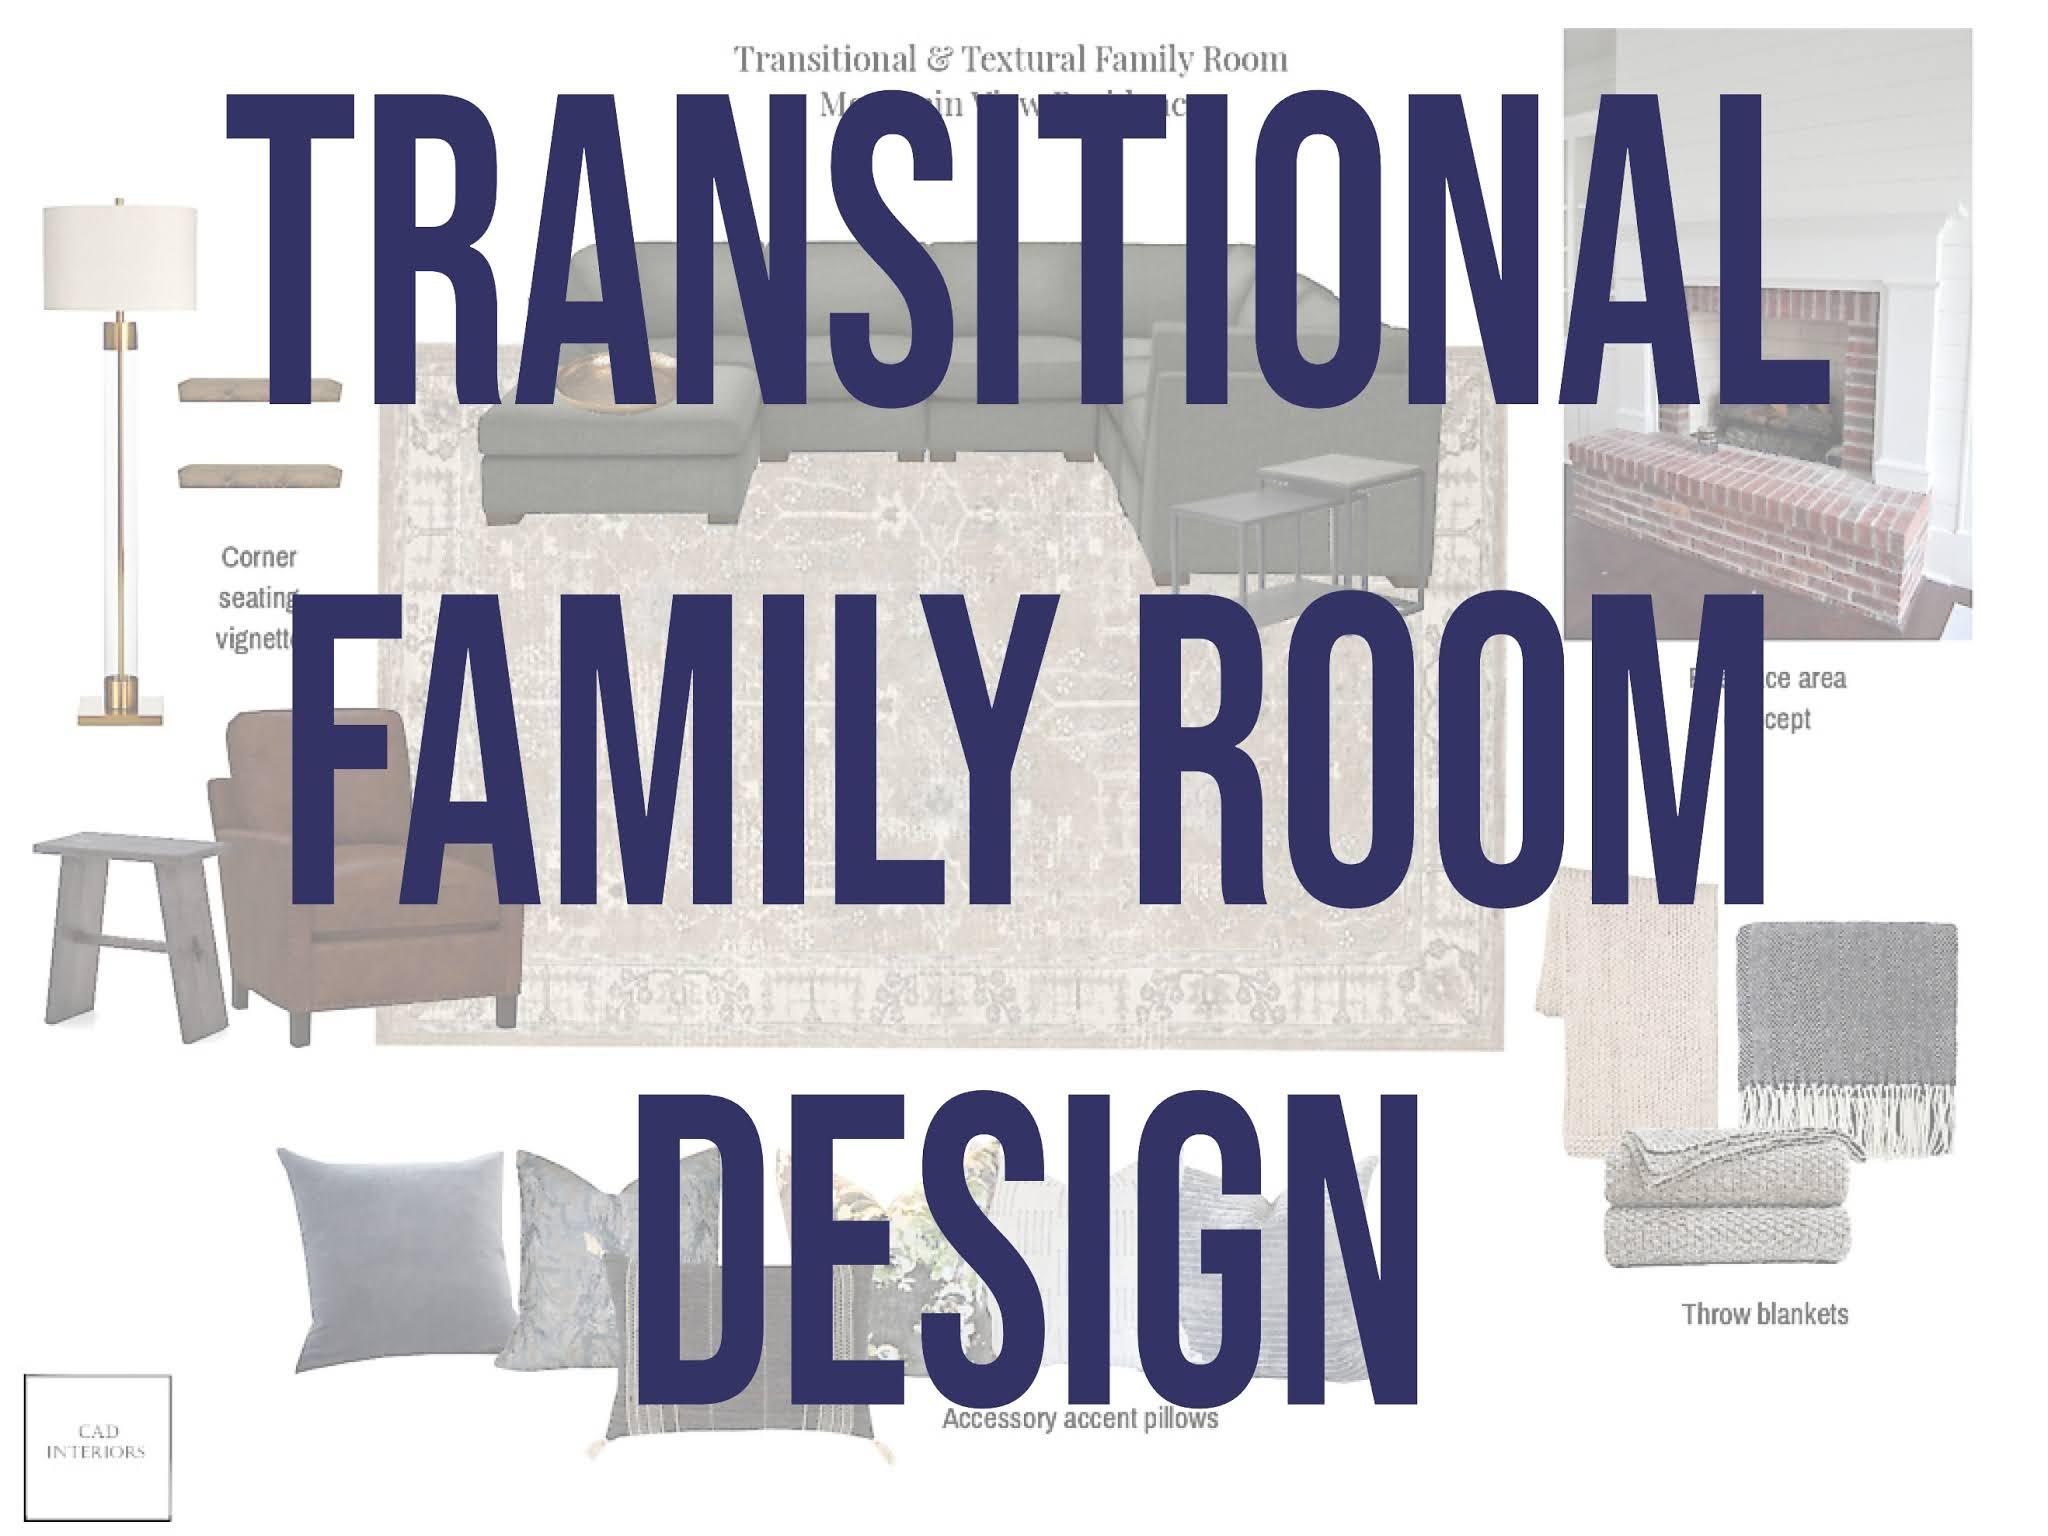 CAD Interiors professional online virtual interior e-design services